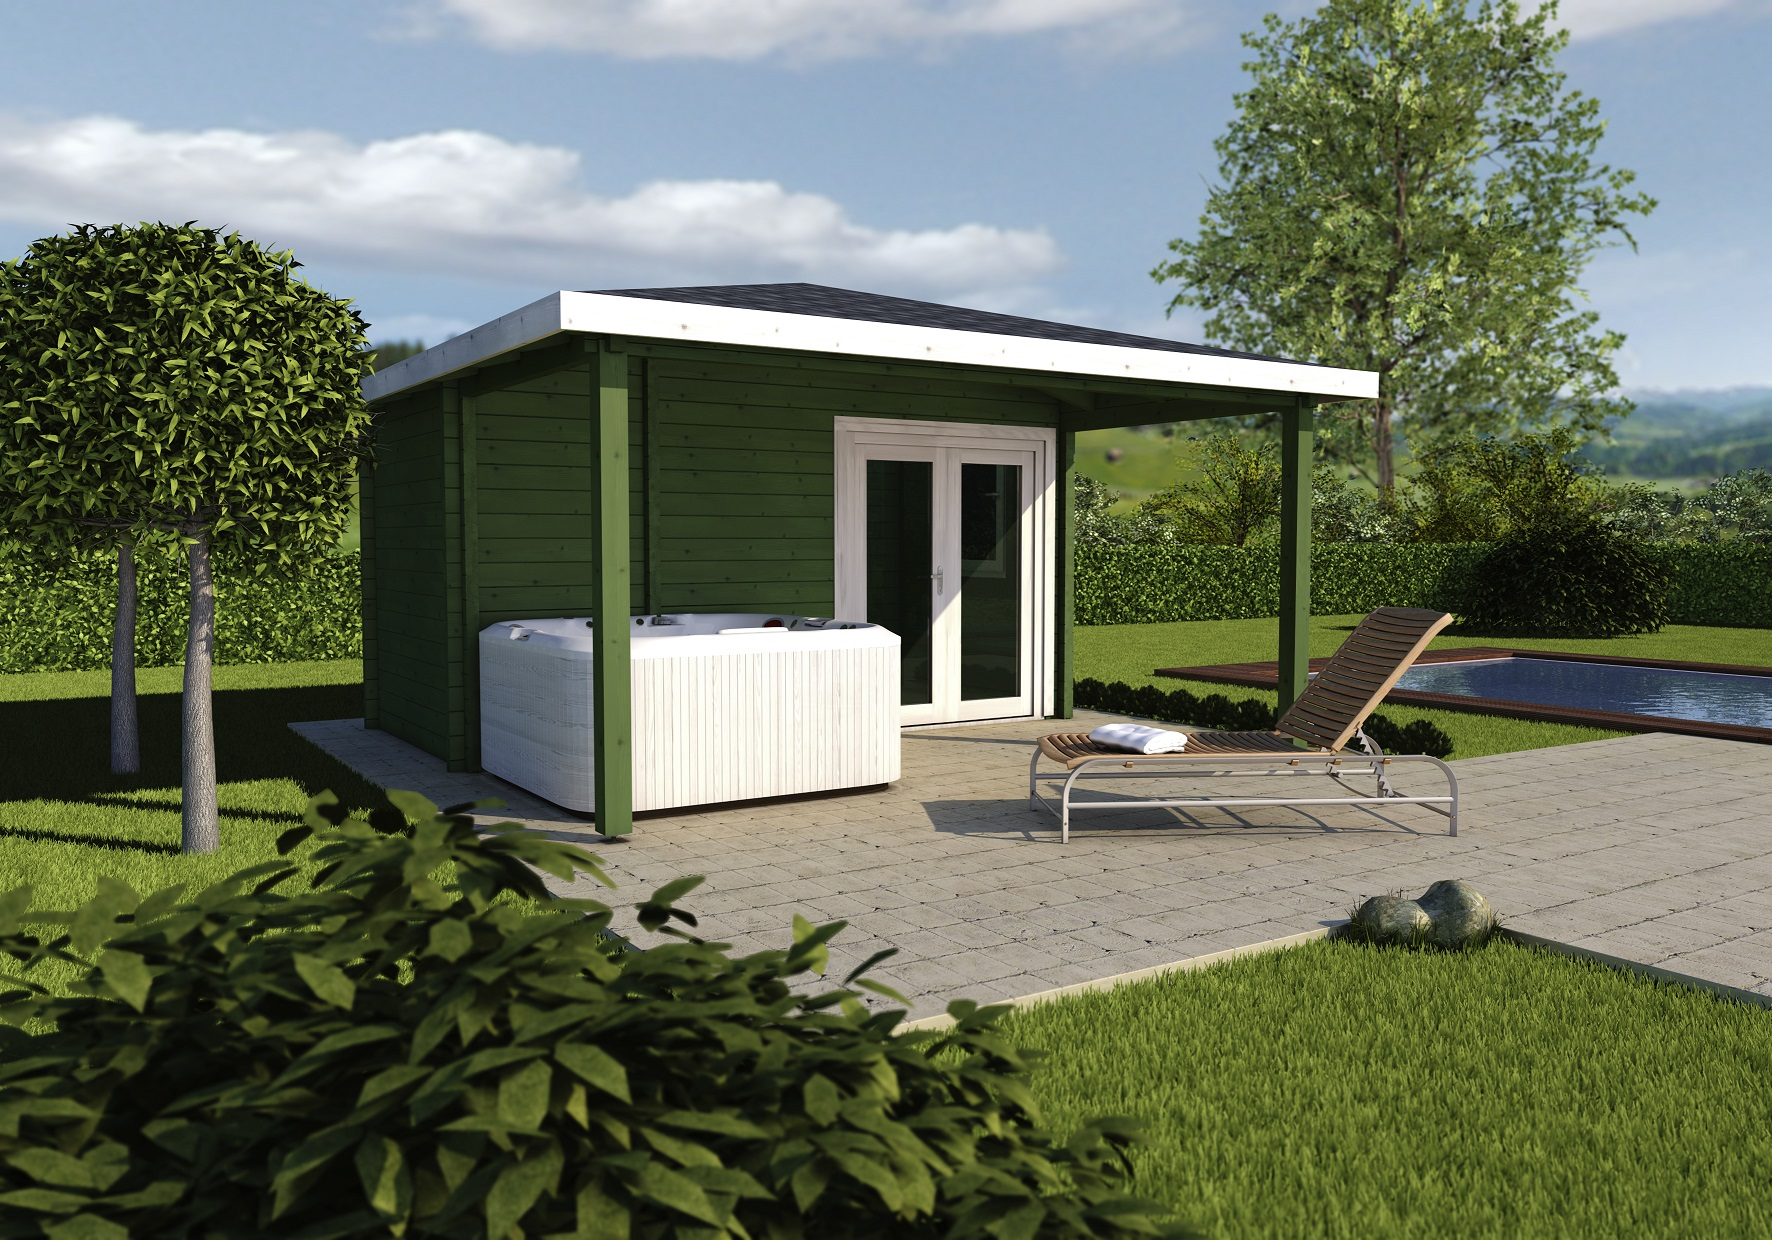 Wellness whirlpool sauna pool b der ausstellung m nster - Saunahaus mit whirlpool ...